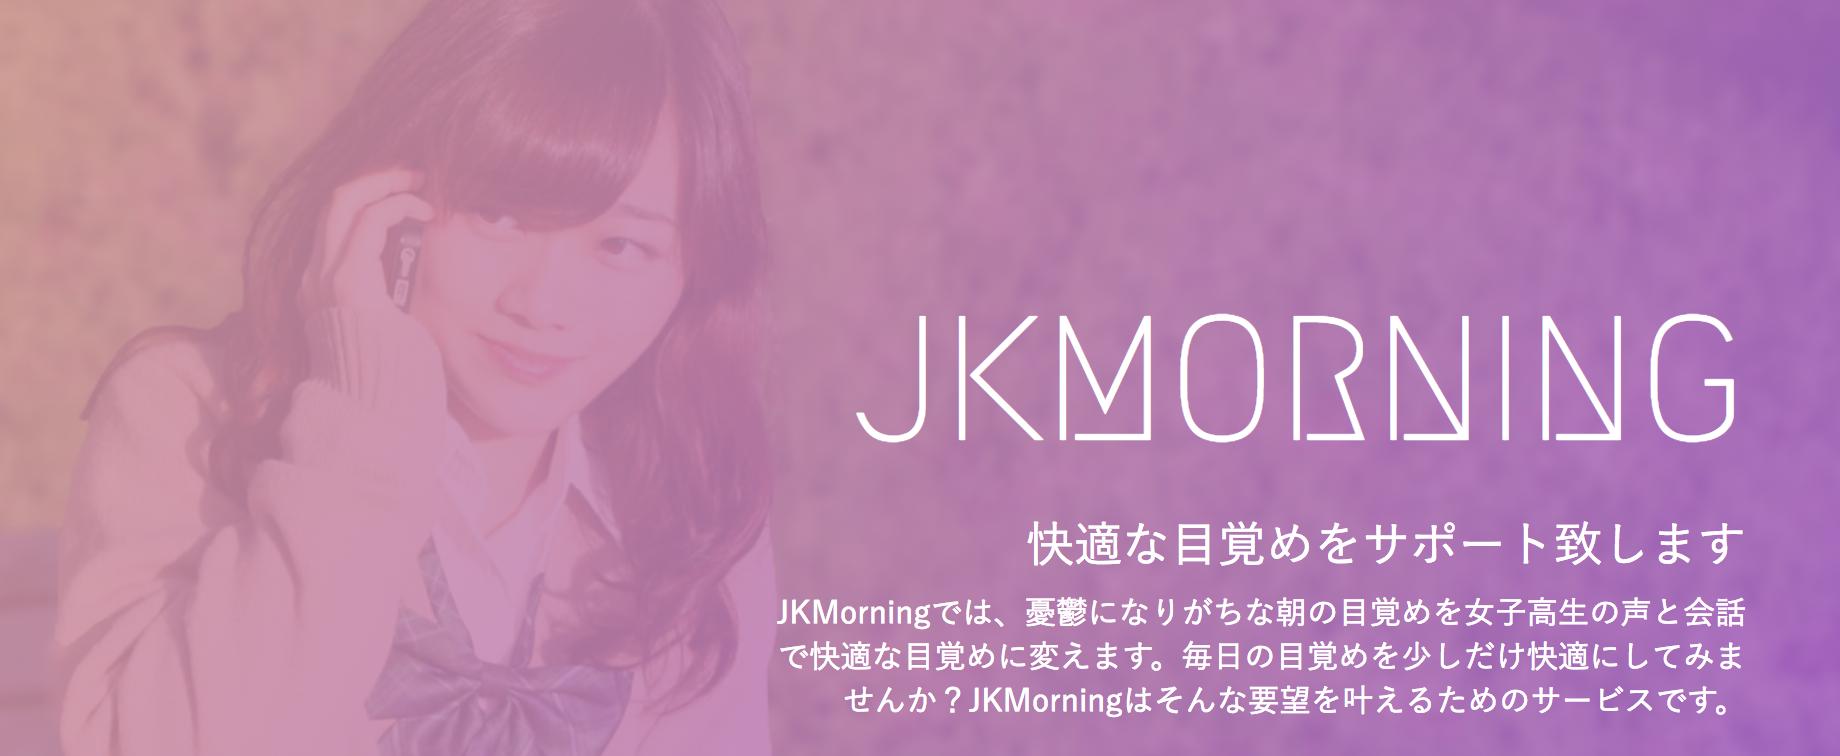 【JKMorning】JKがモーニングコールしてくれる禁断のサービスが存在した